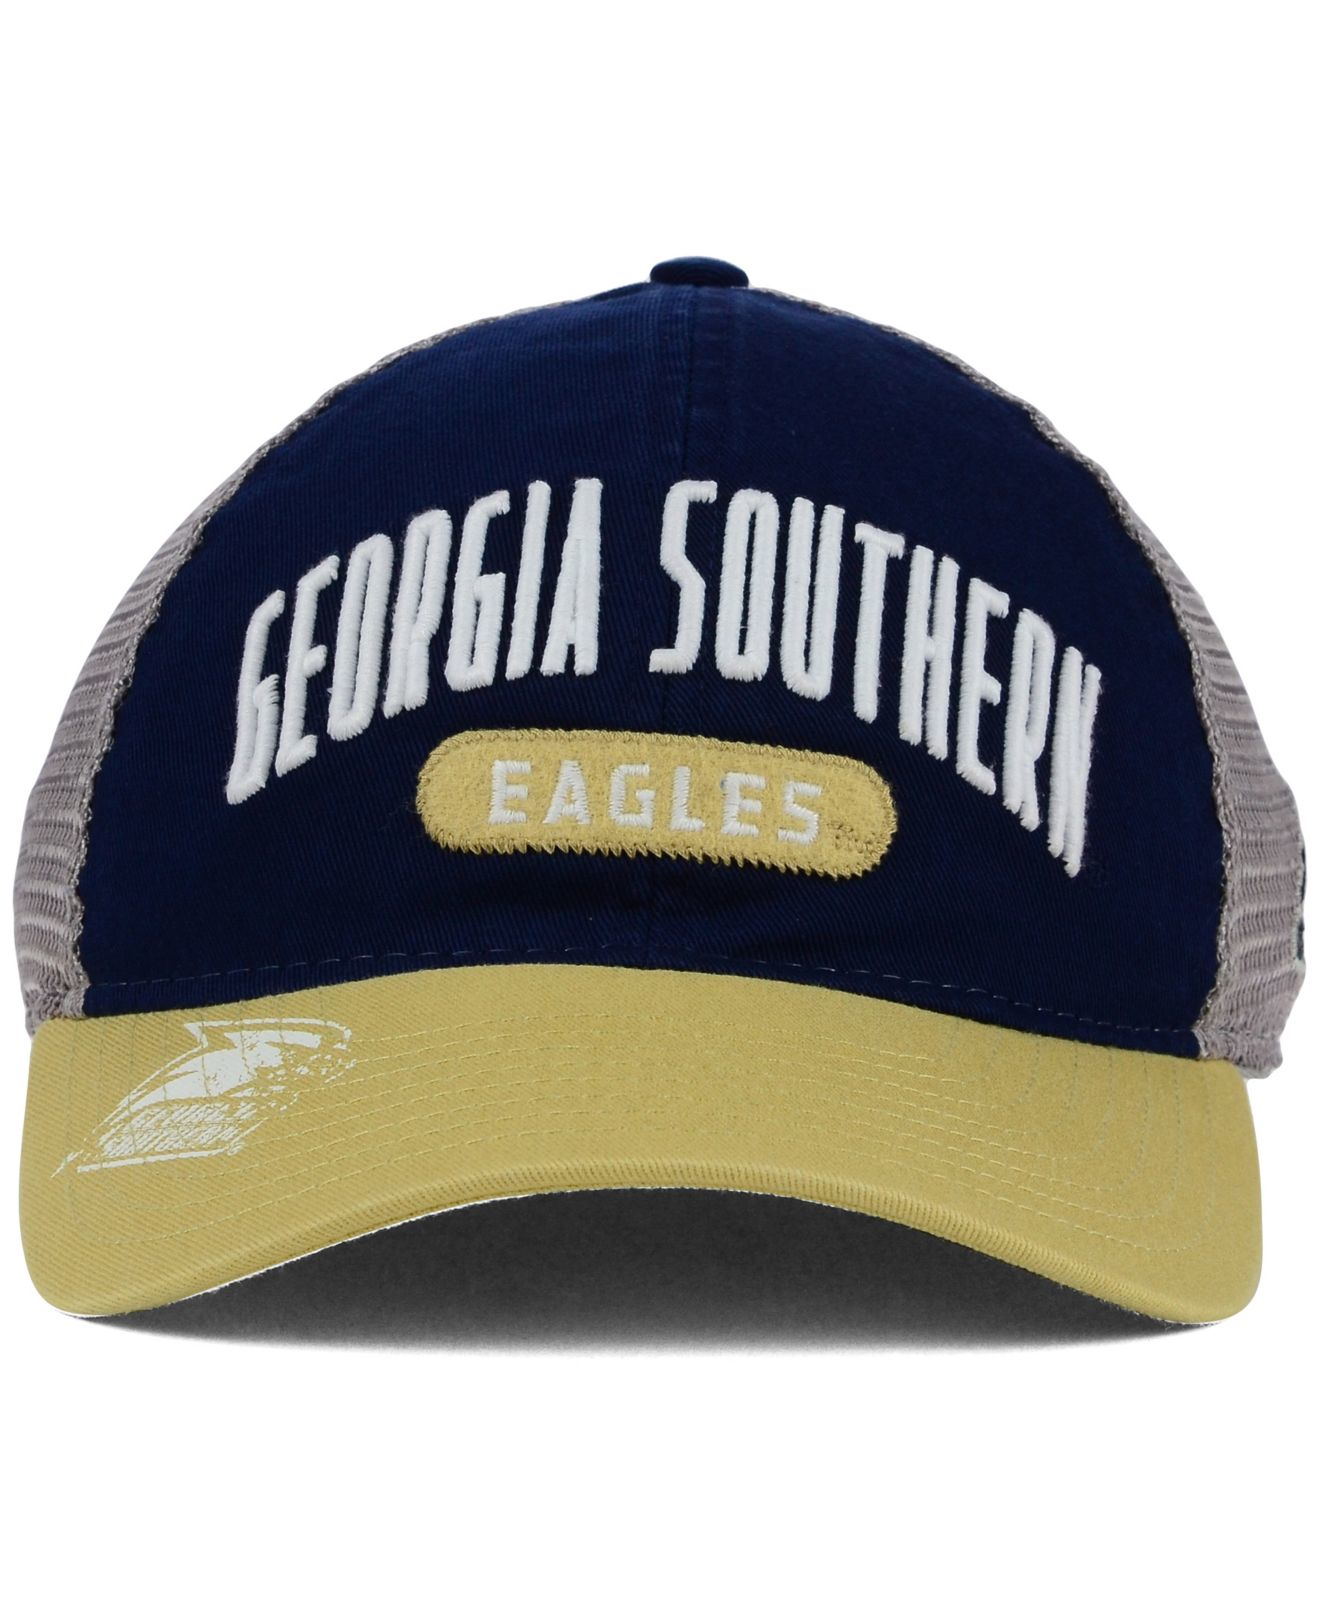 b7c8435e9fc Lyst - adidas Originals Georgia Southern Eagles Adjustable Mesh ...